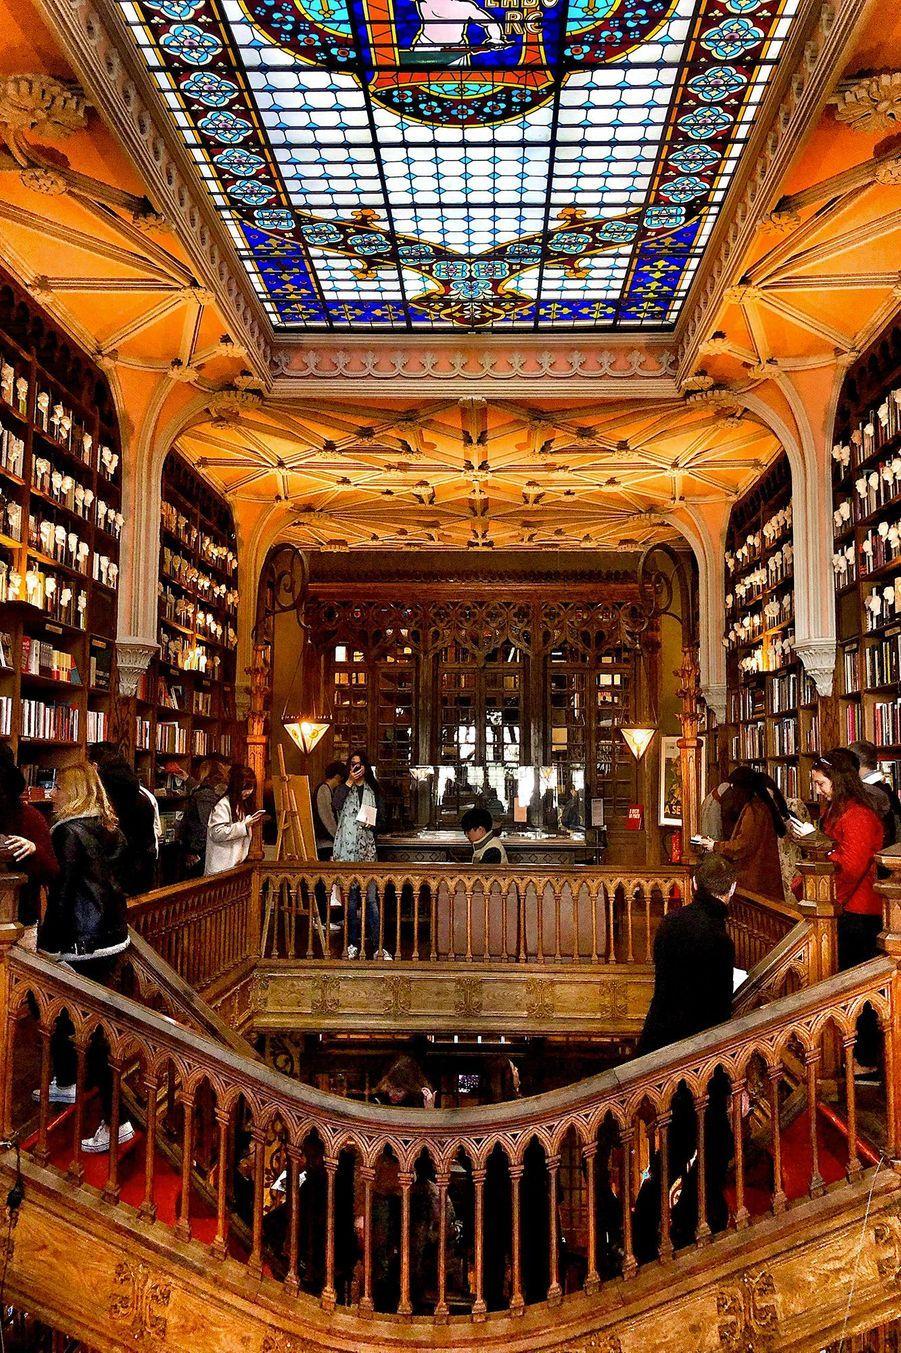 Emblème de la ville de Porto, La Livraria Lello.